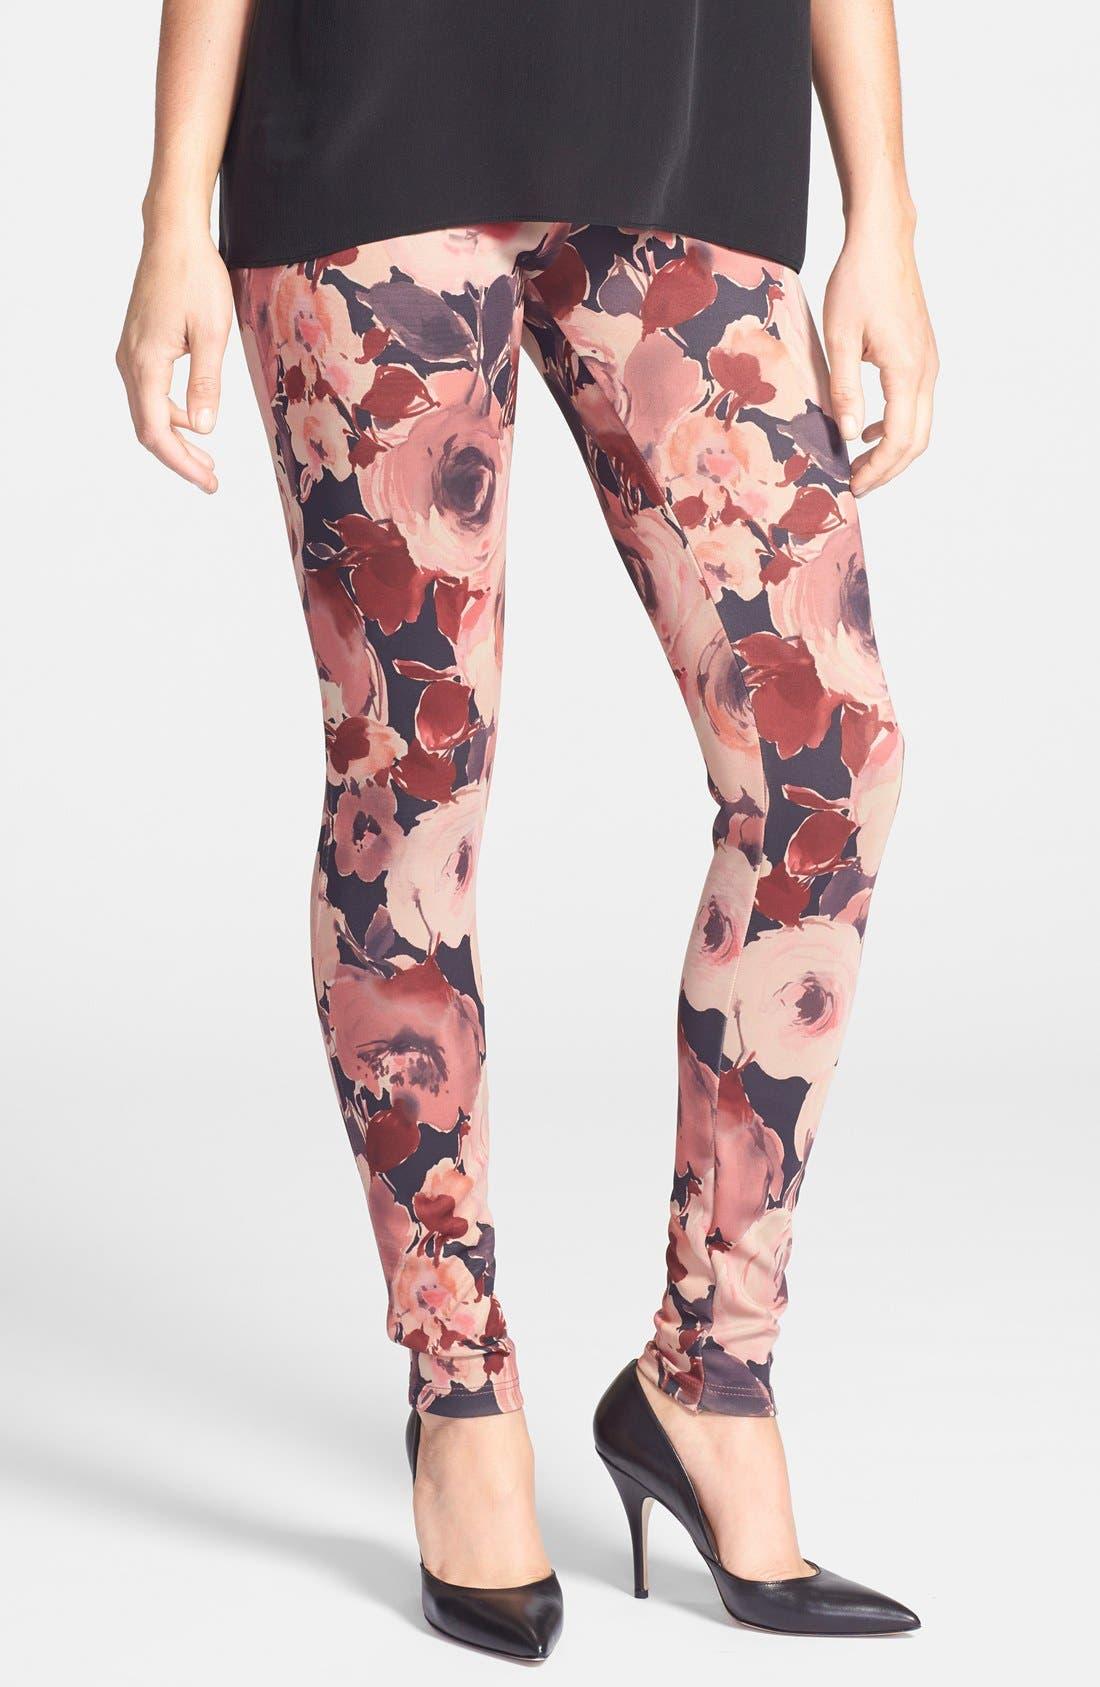 Alternate Image 1 Selected - Oroblu 'Flower' Print Leggings